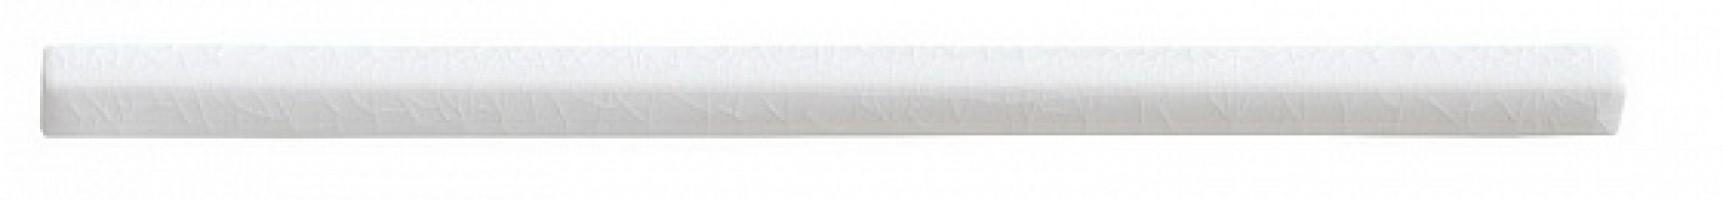 Бордюр Modernista ADMO5449 Bullnose Trim C/C Cadet Gray 0.85x15 Adex